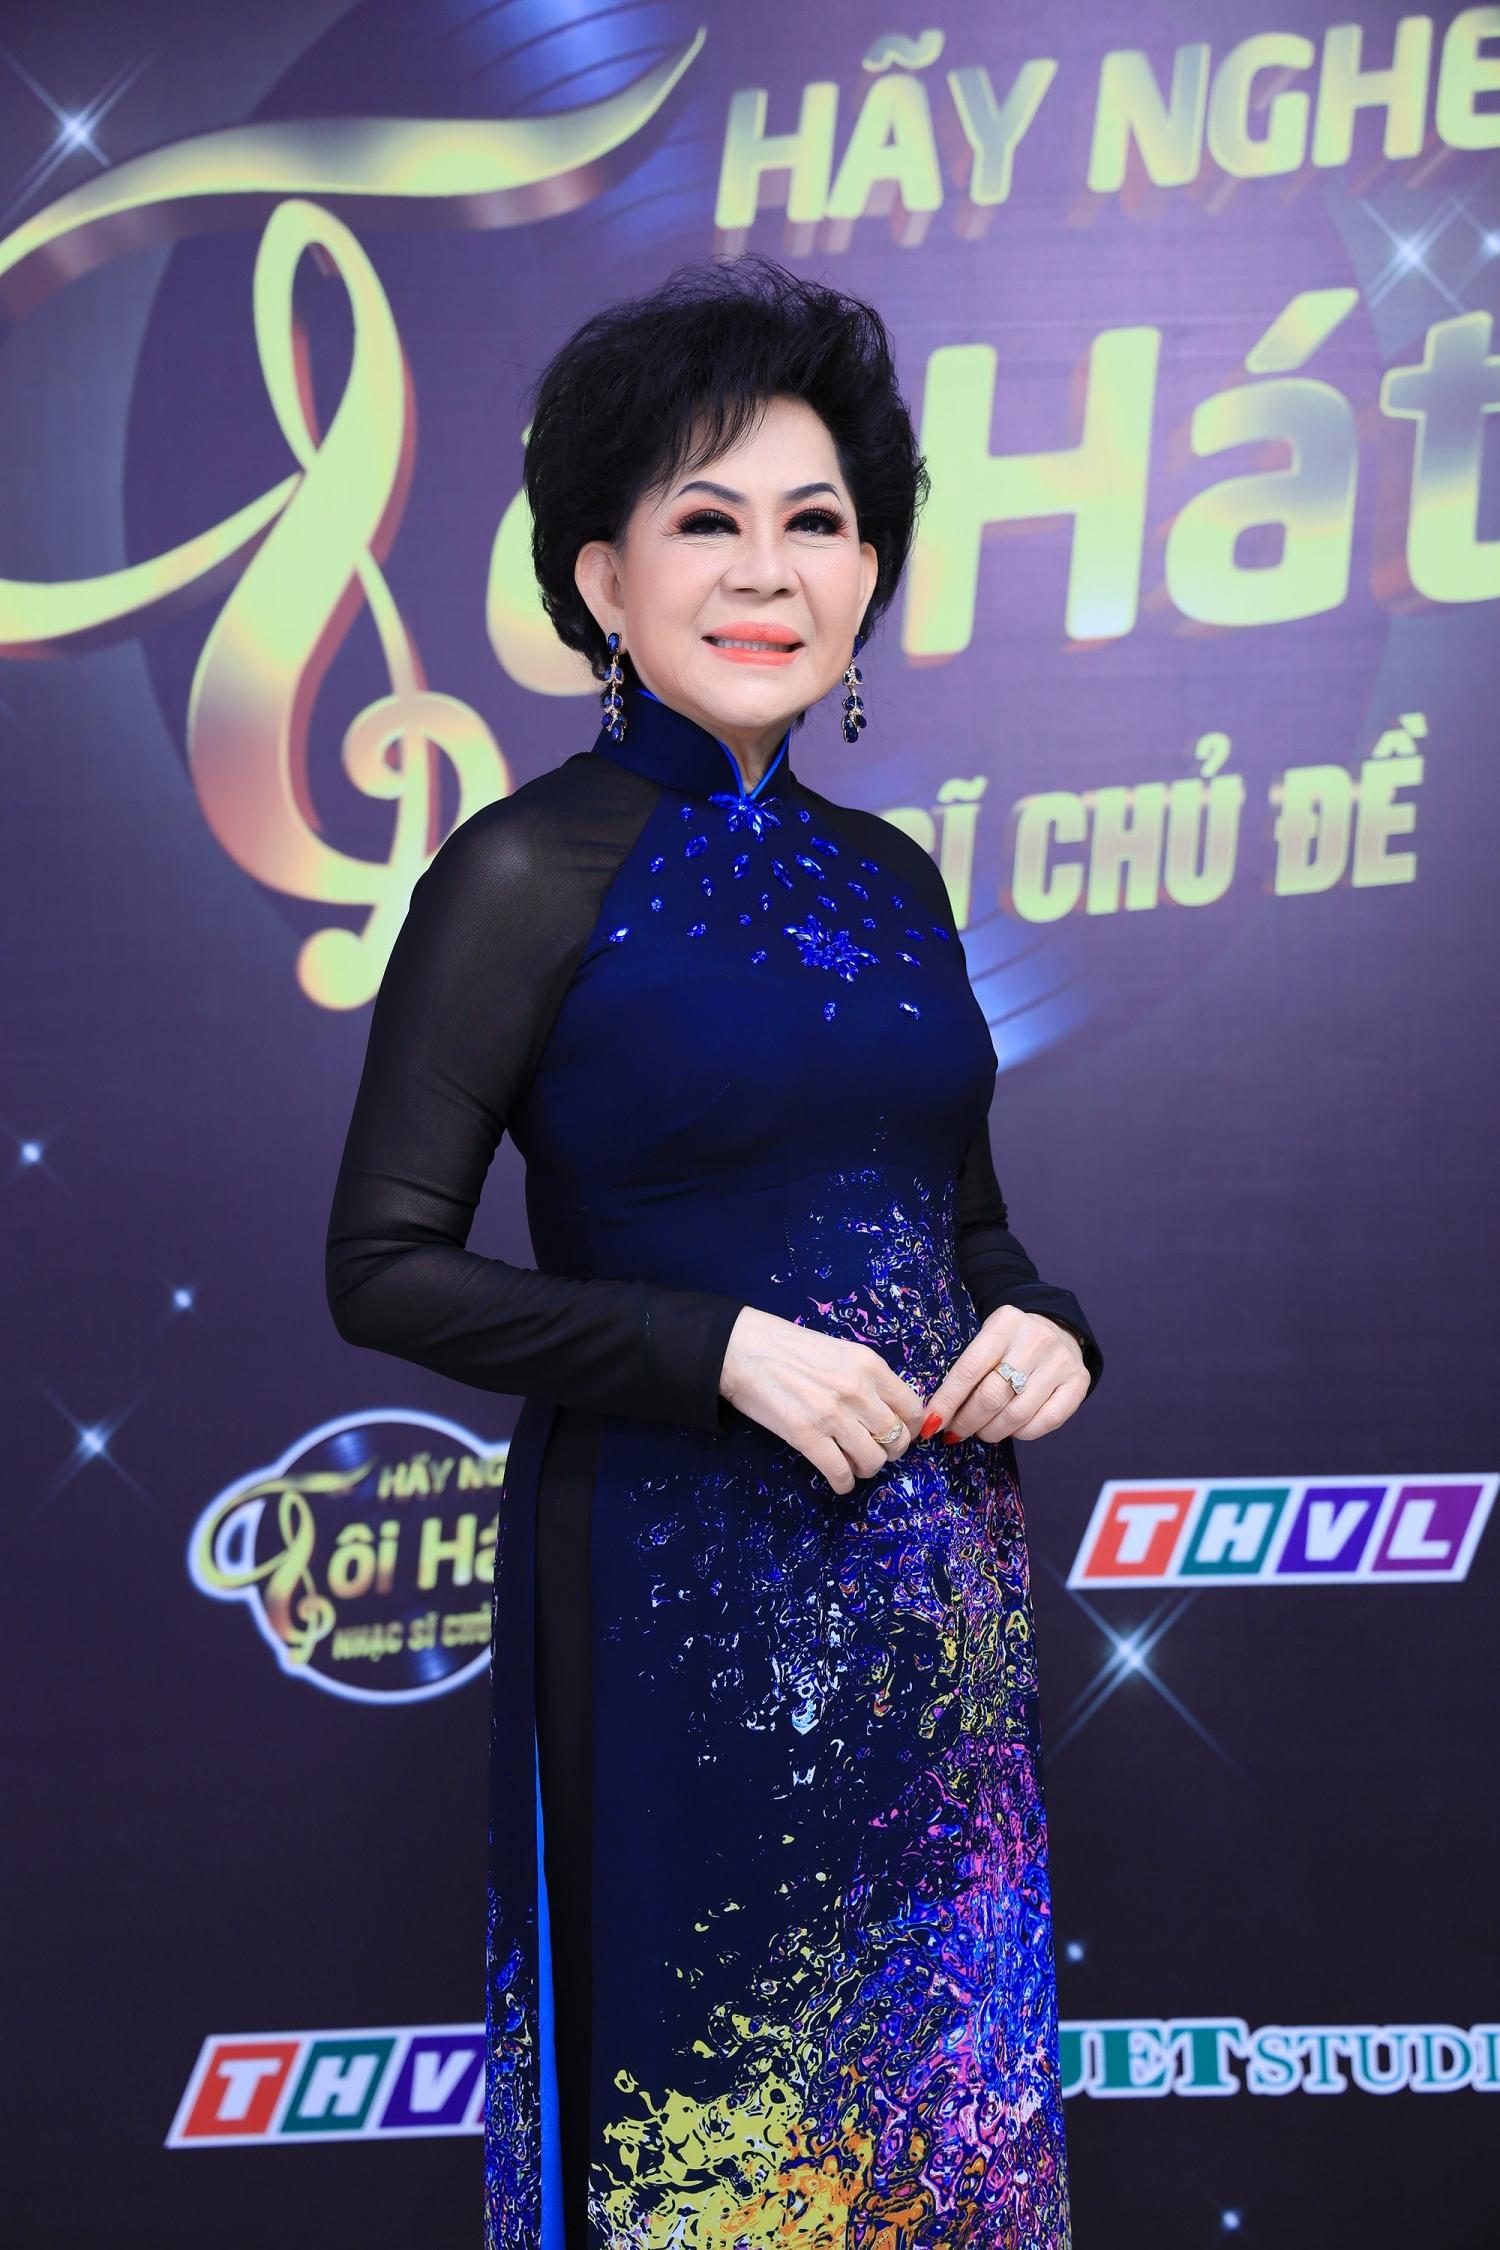 thai chau toi ghet hat boleo theo kieu ngheo doi benh tat the luong